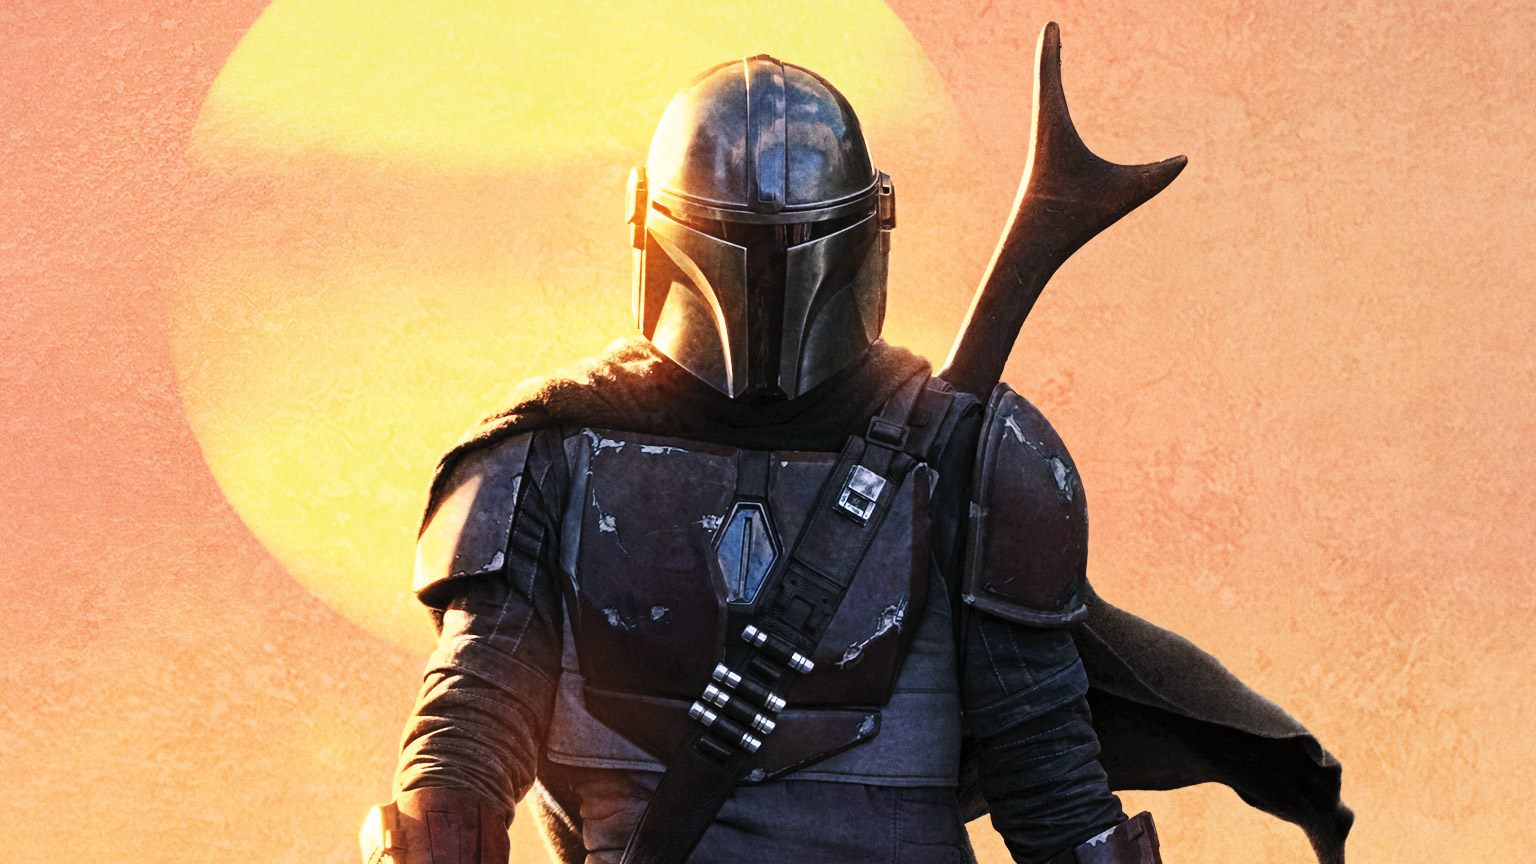 Popular Sci-Fi Shows The Mandalorian